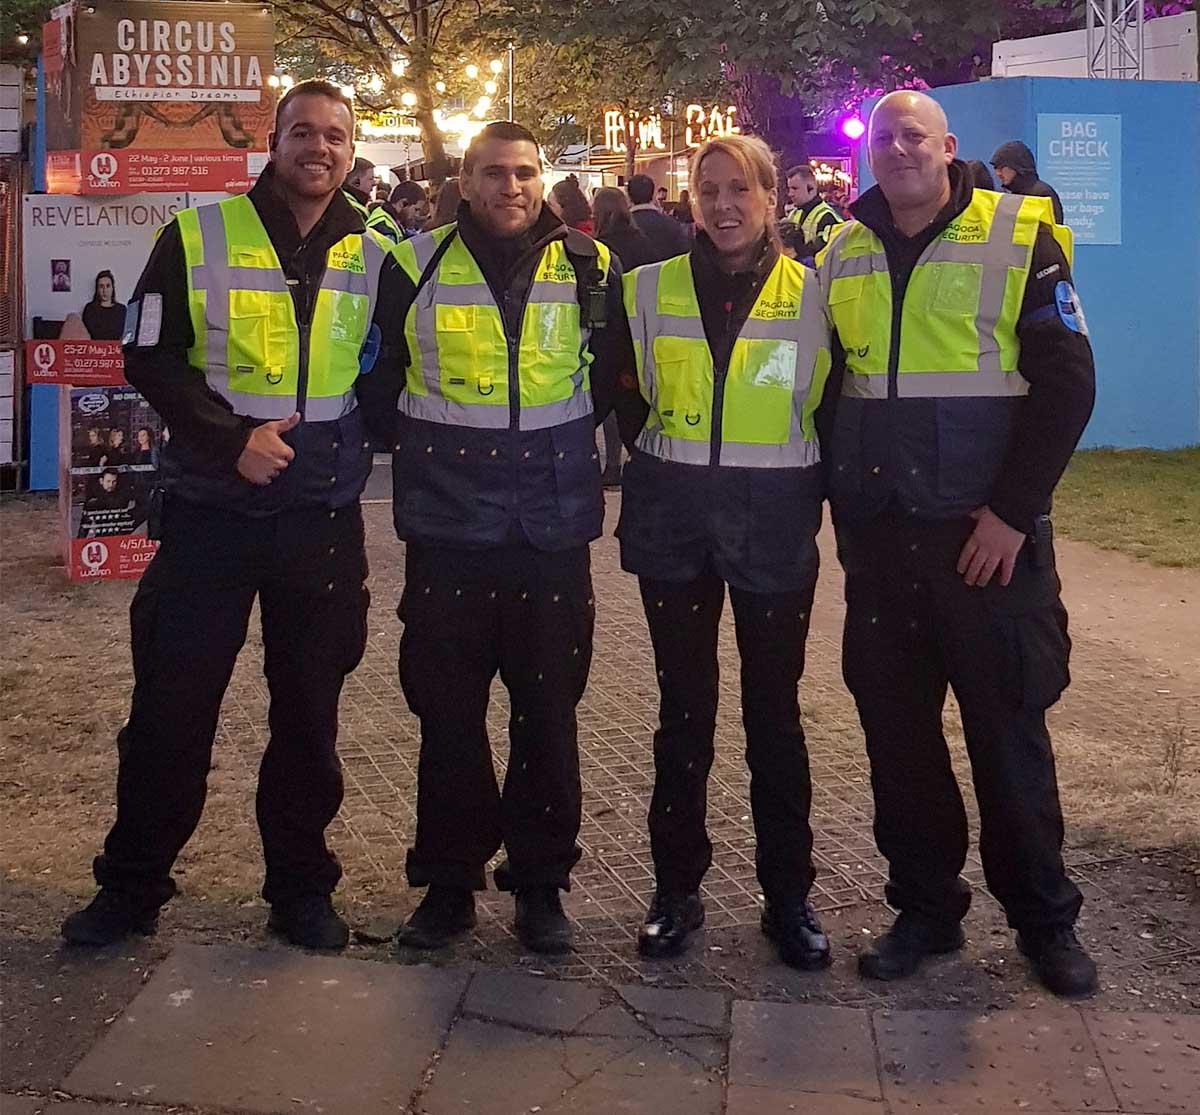 Pagoda Security Staff